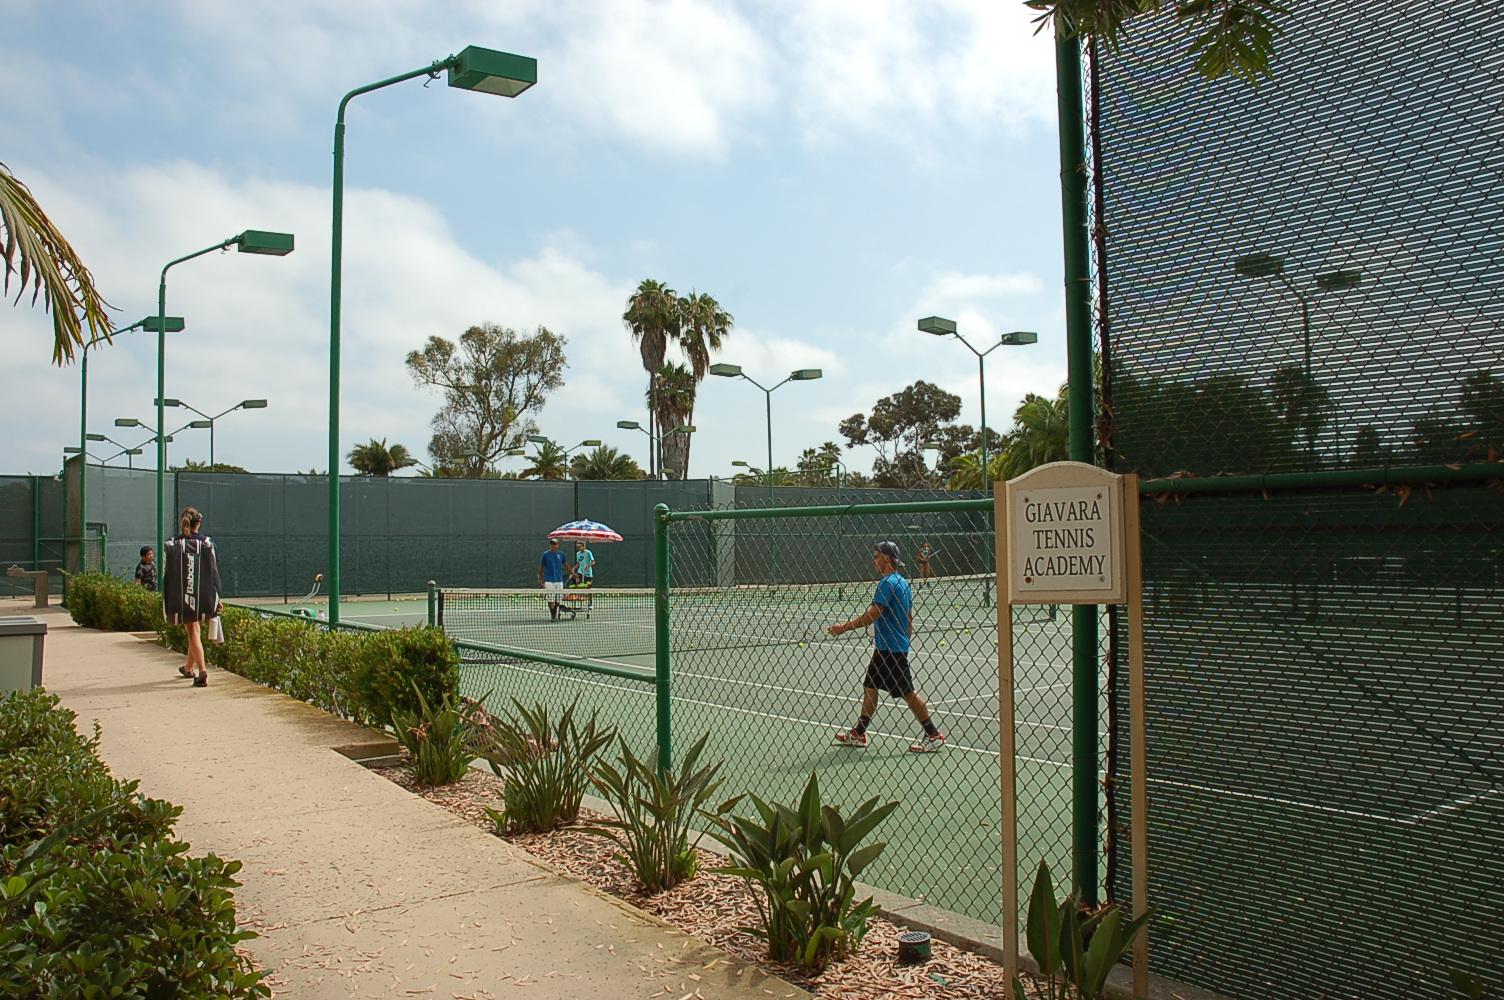 Giavara Tennis Academy courts